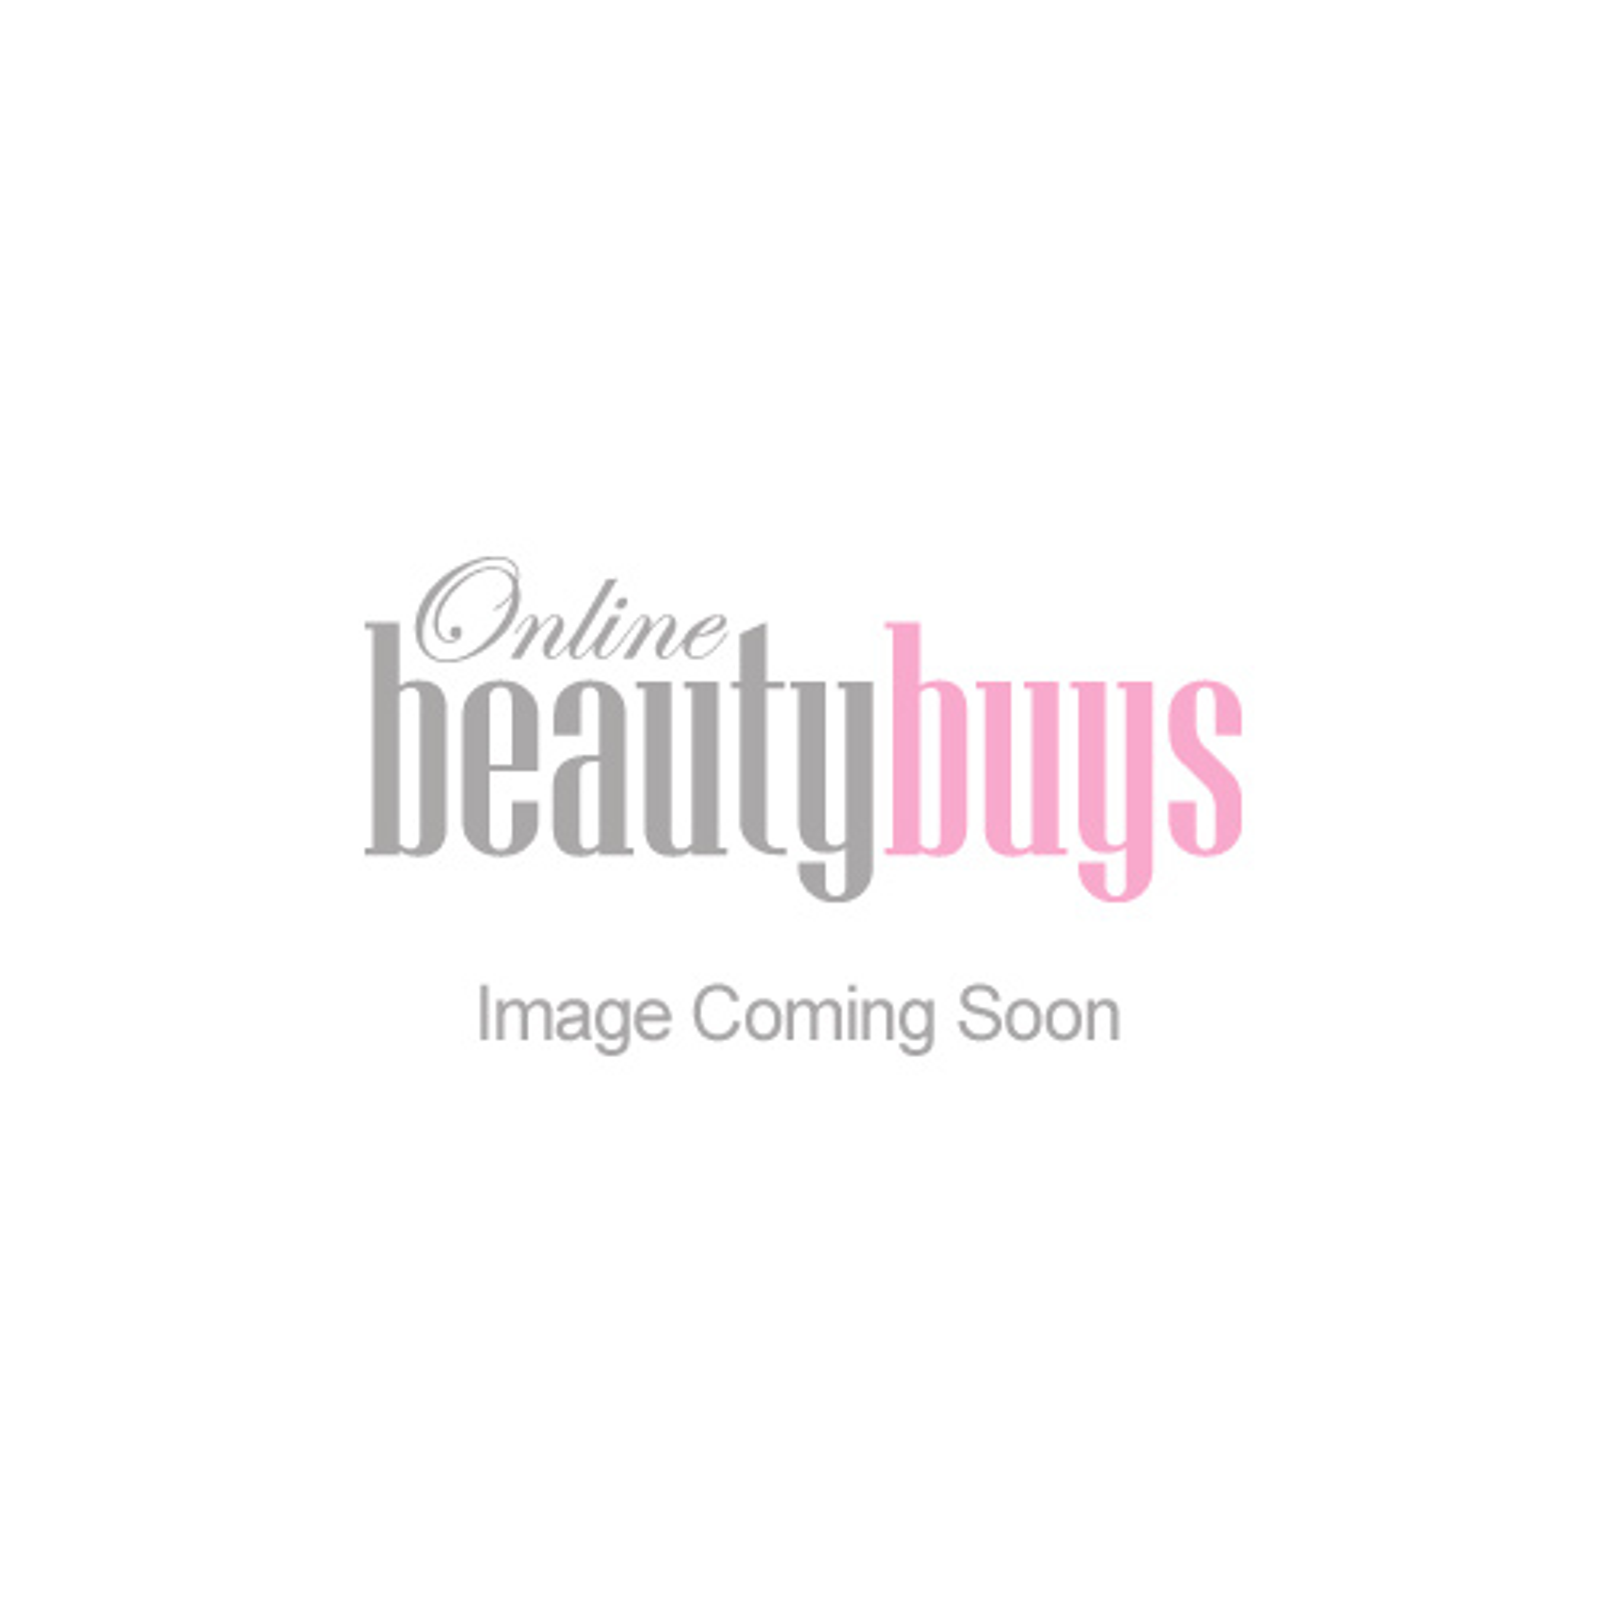 NEW Guerlain Super Aqua Serum 50ml FREE P&P